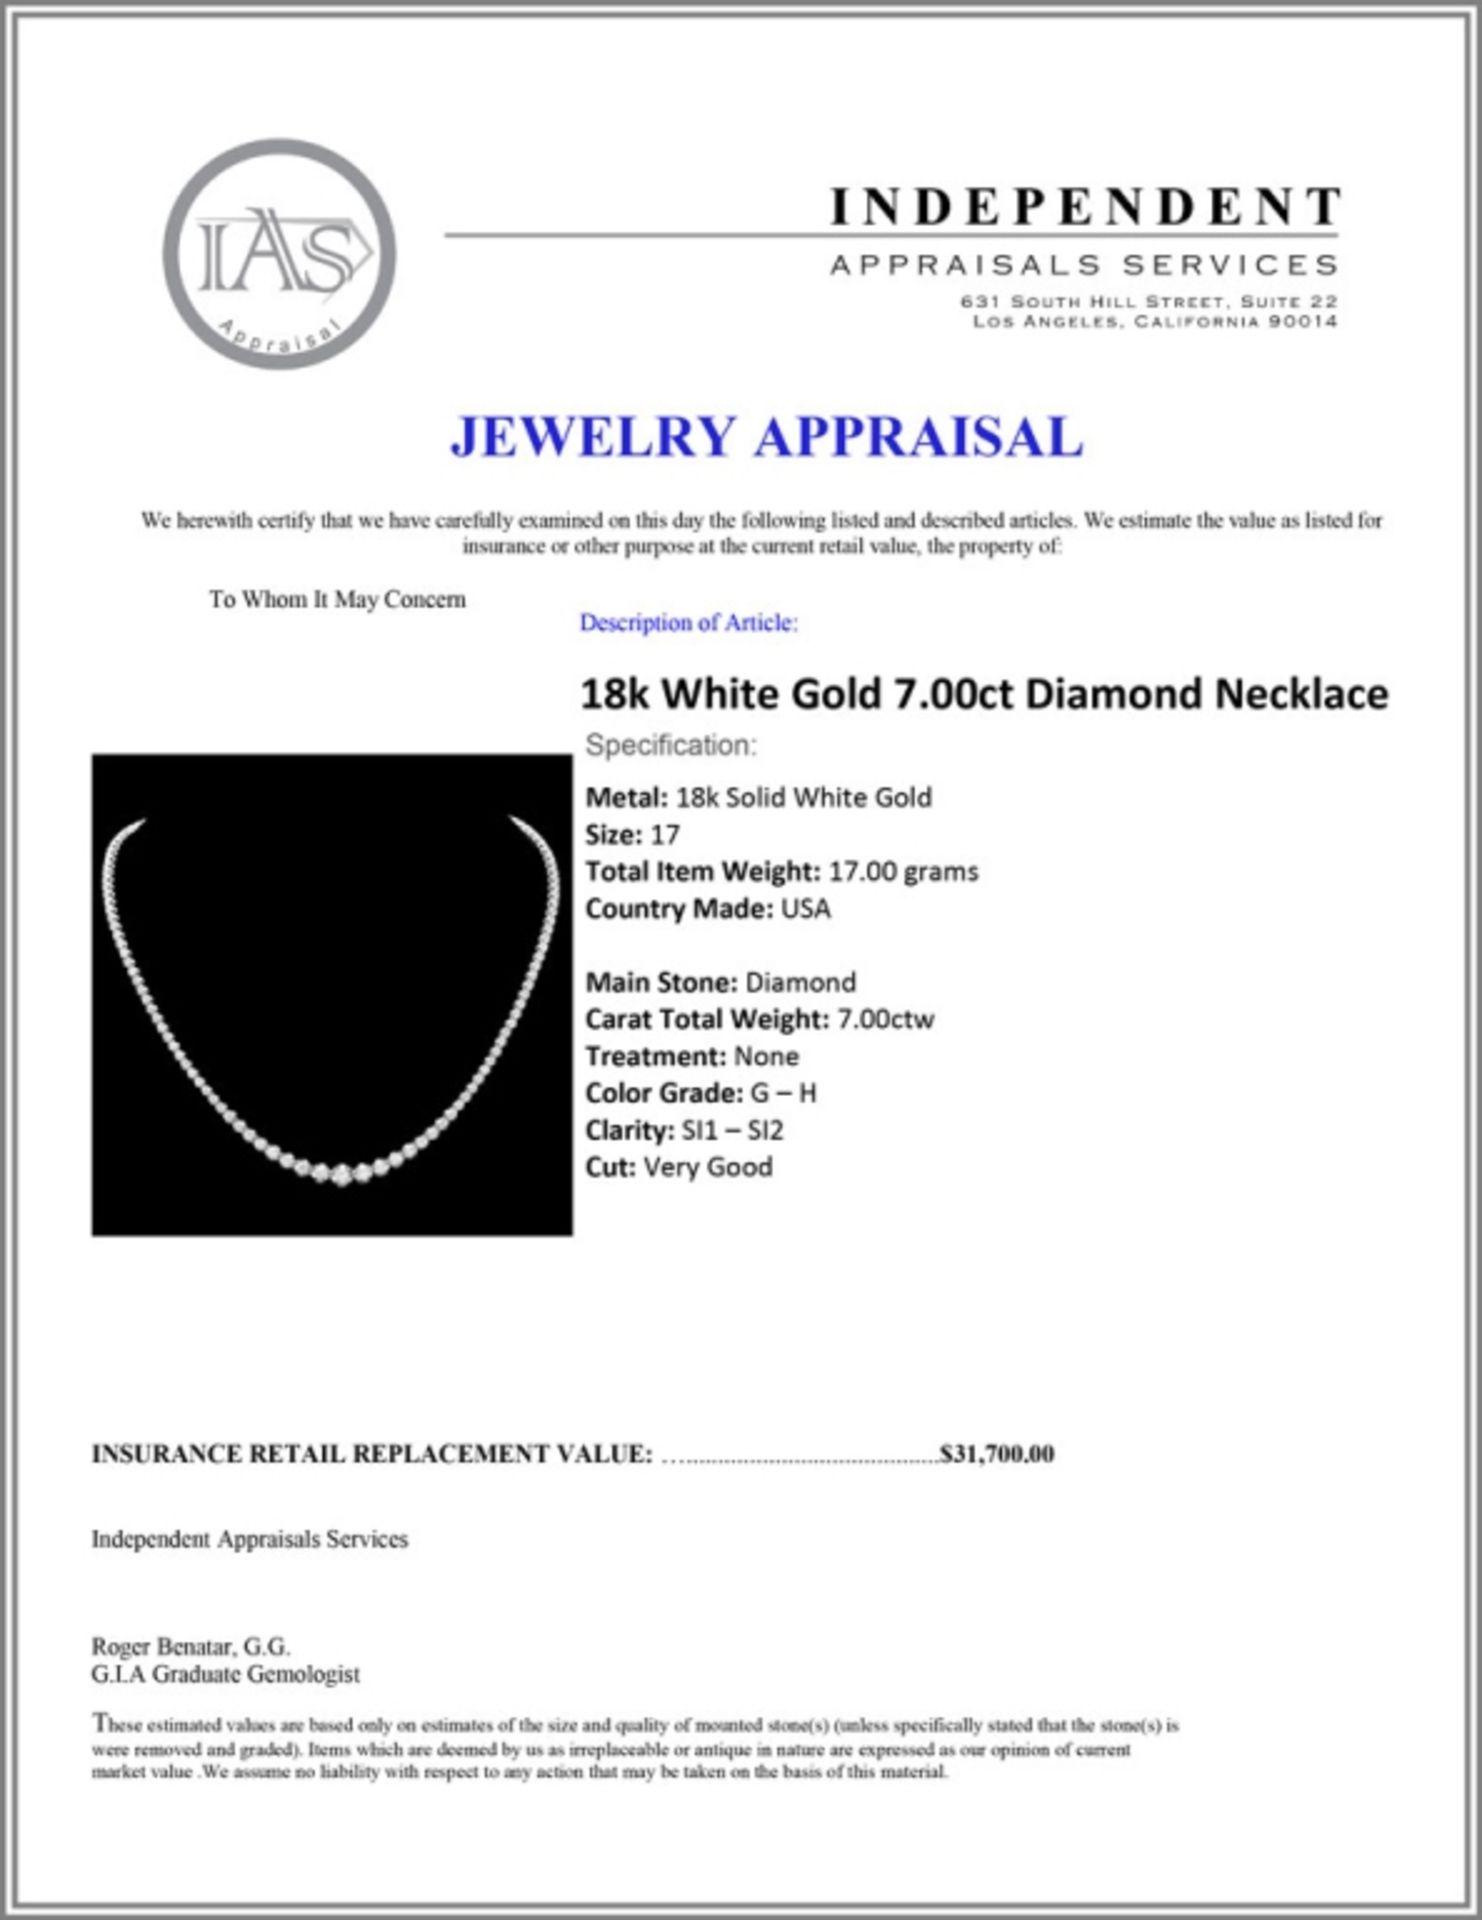 18k White Gold 7.00ct Diamond Necklace - Image 3 of 3